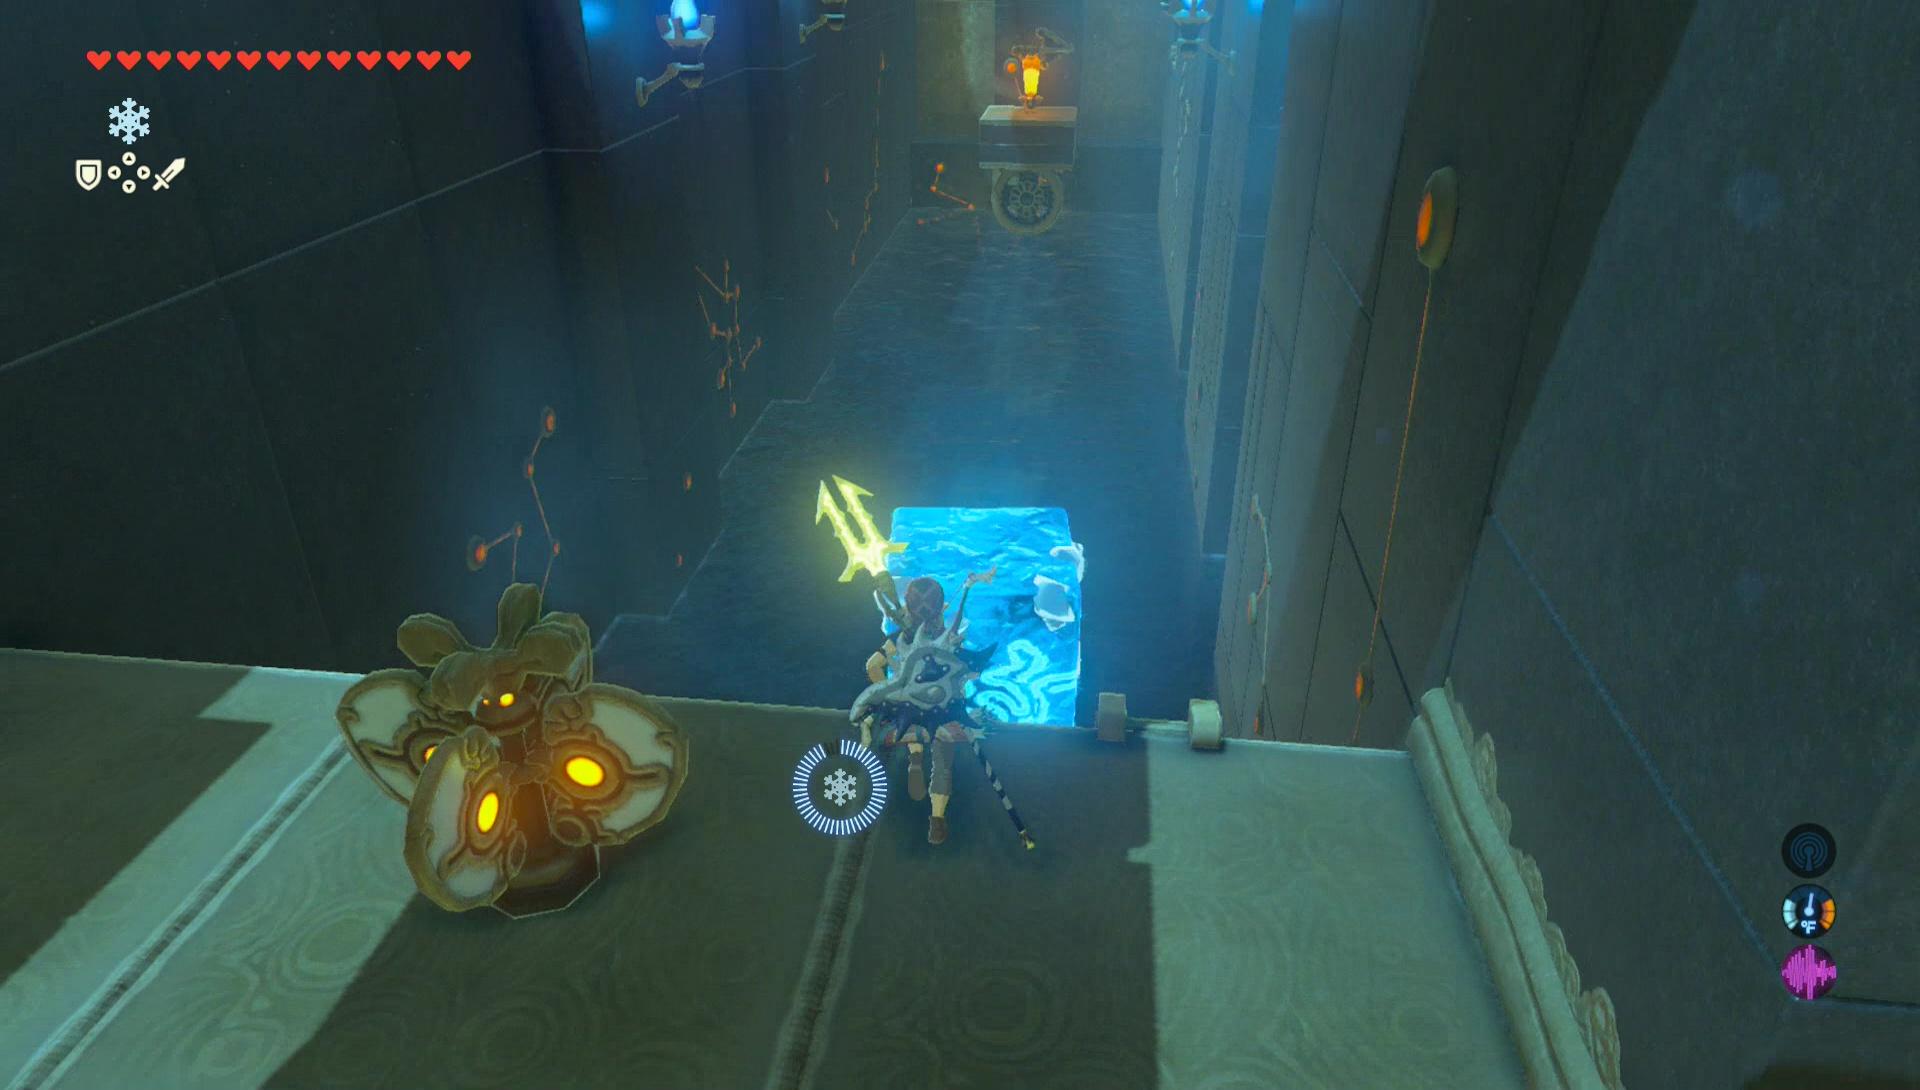 Akh Va Quot Shrine Guide Zelda Dungeon Breath of the wild подробнее. akh va quot shrine guide zelda dungeon